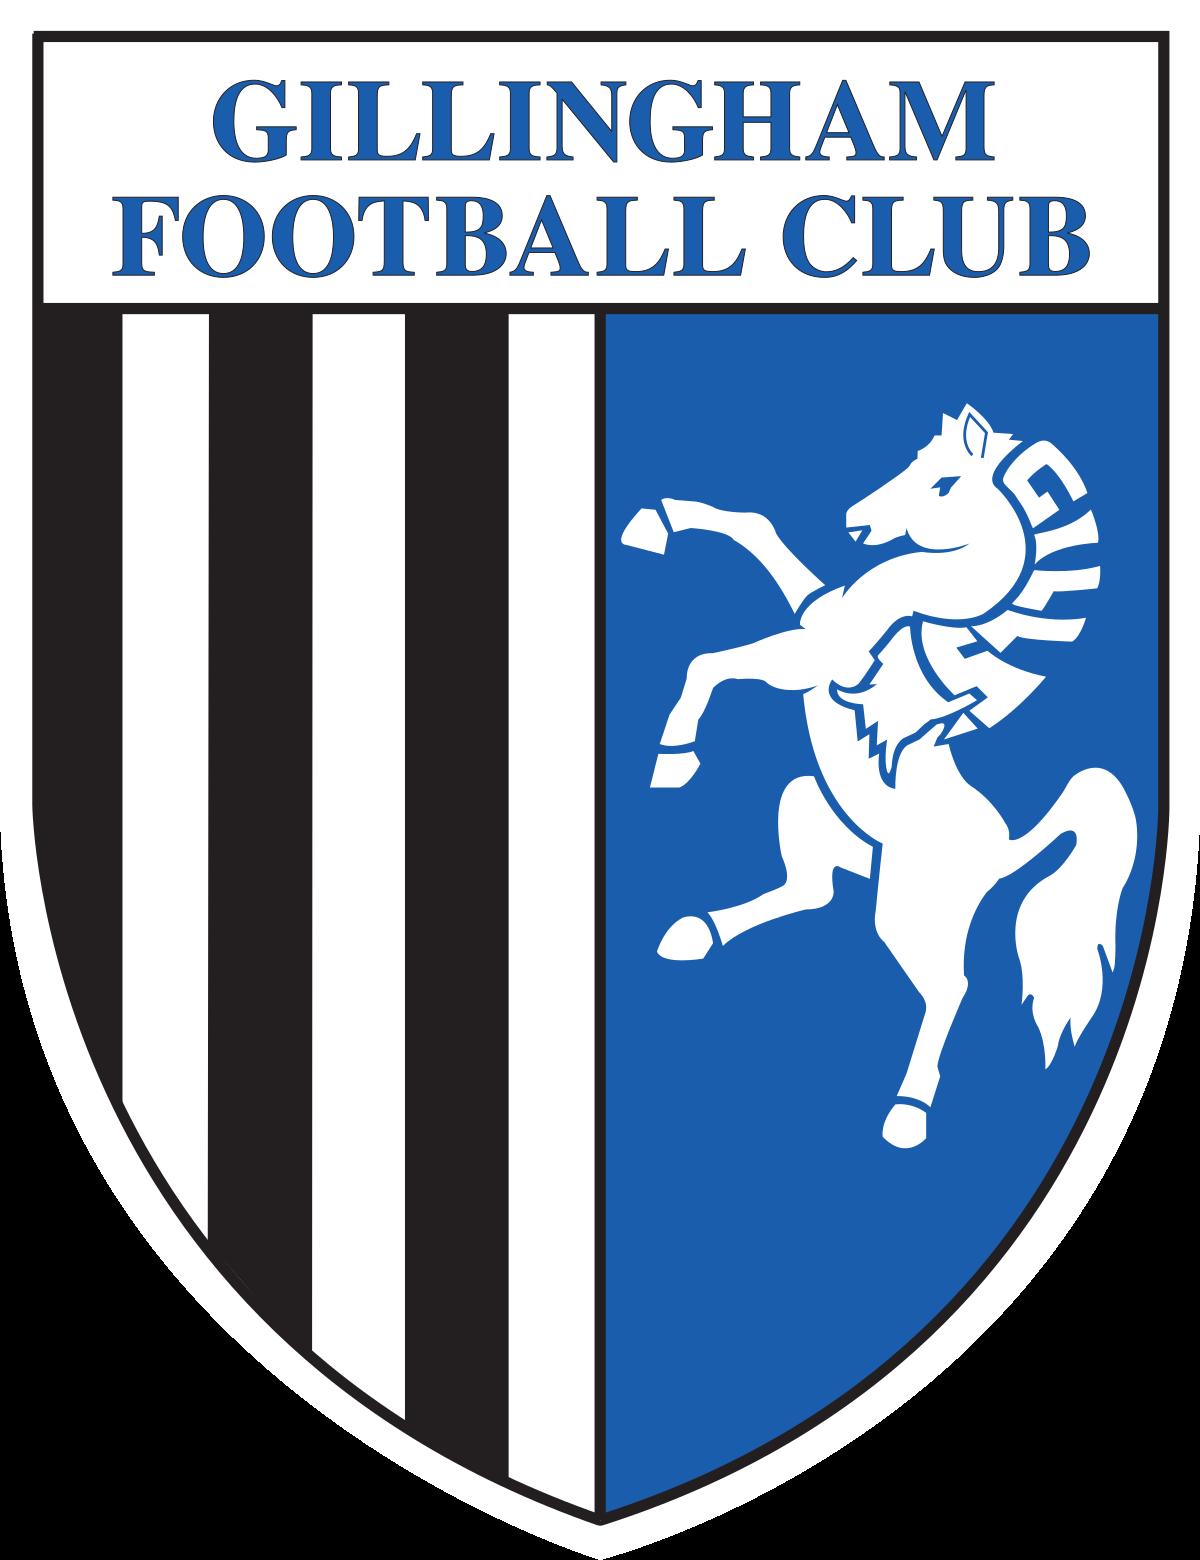 Gillingham Football Club